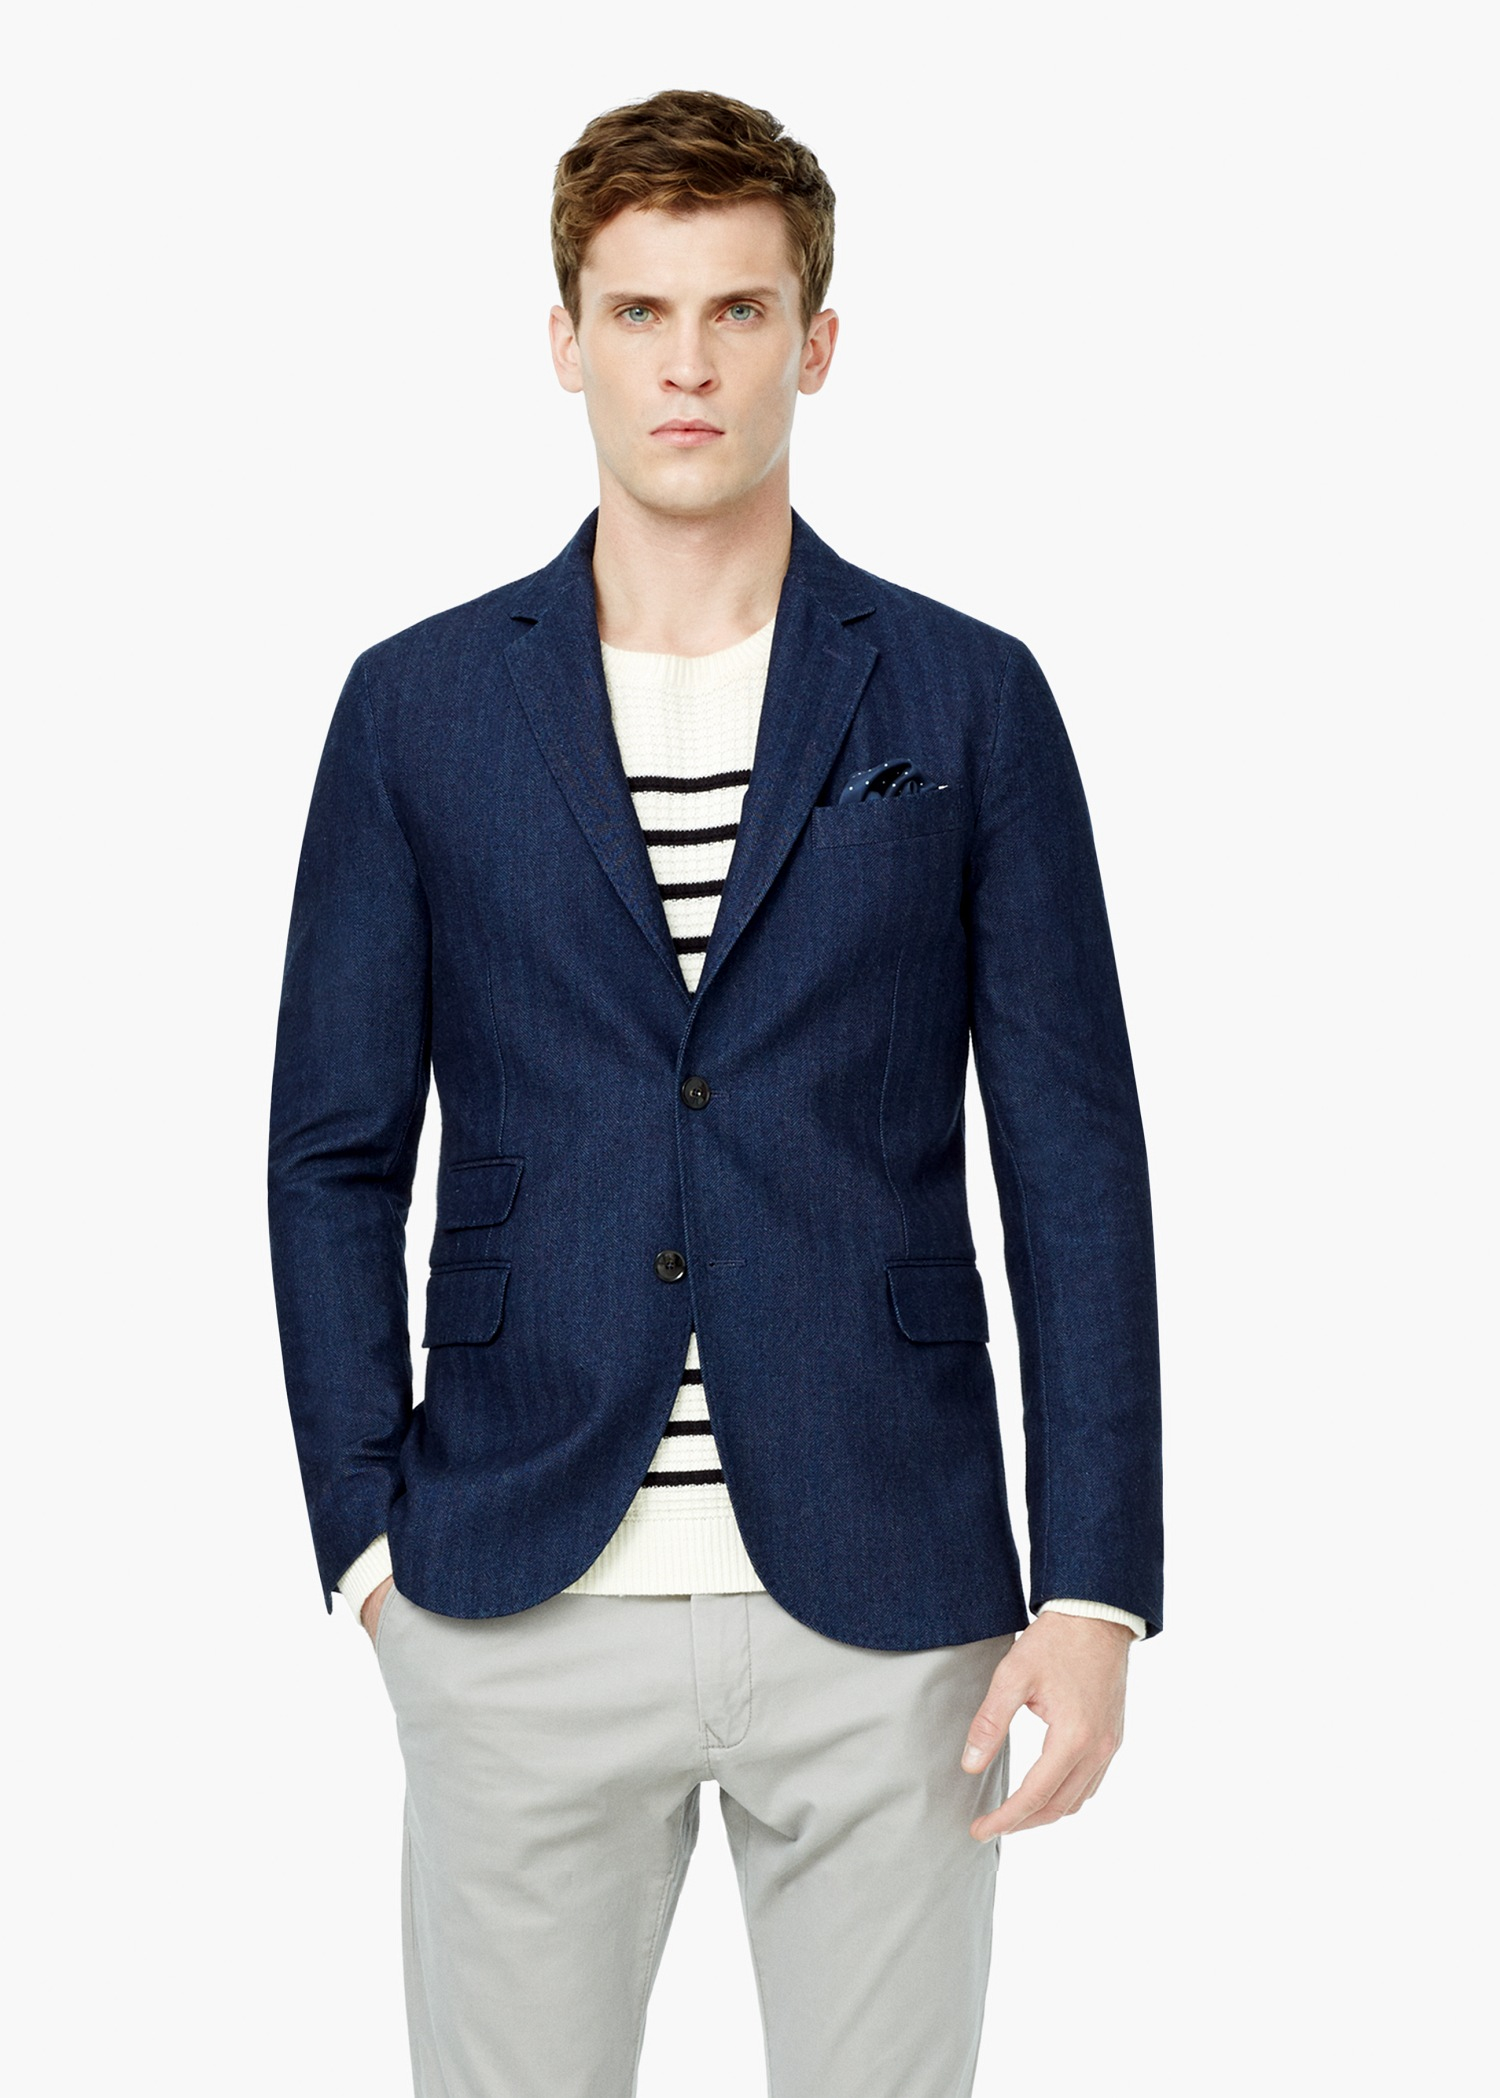 Mens Blue Cotton Blazer Hardon Clothes